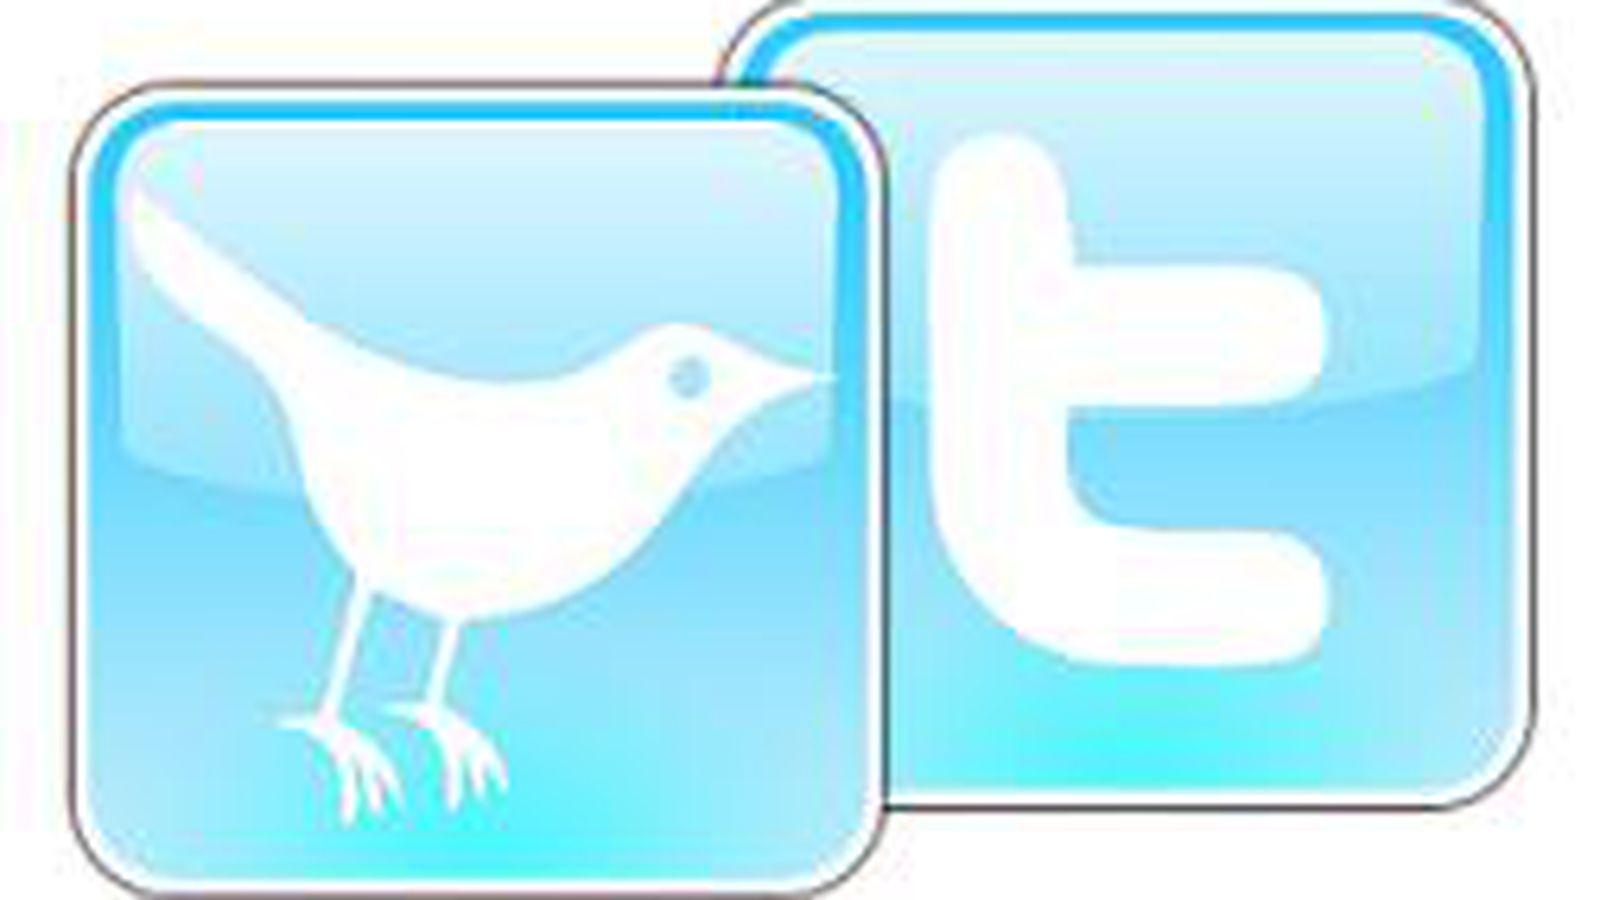 Twitter.0